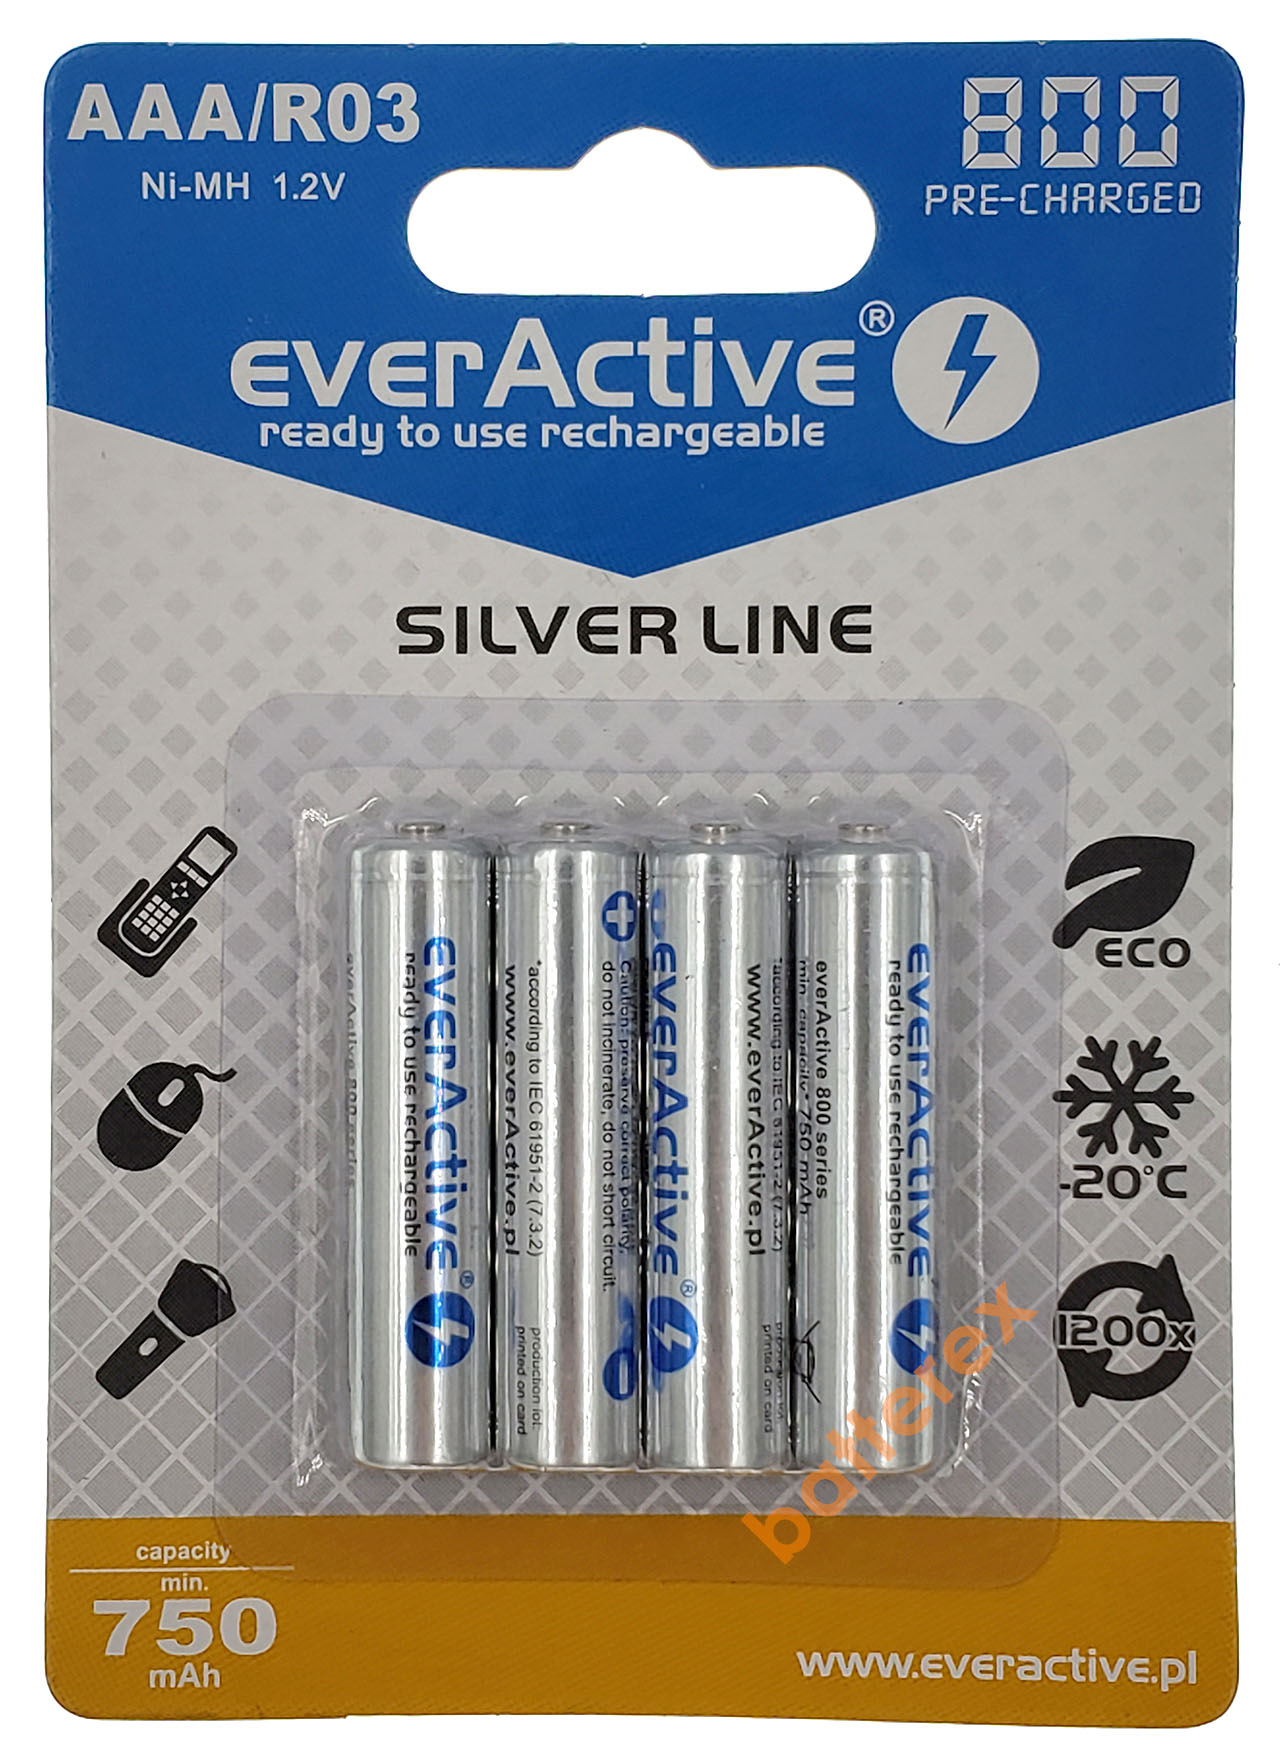 4 аккумулятора AAA Everactive 800mah в подарок